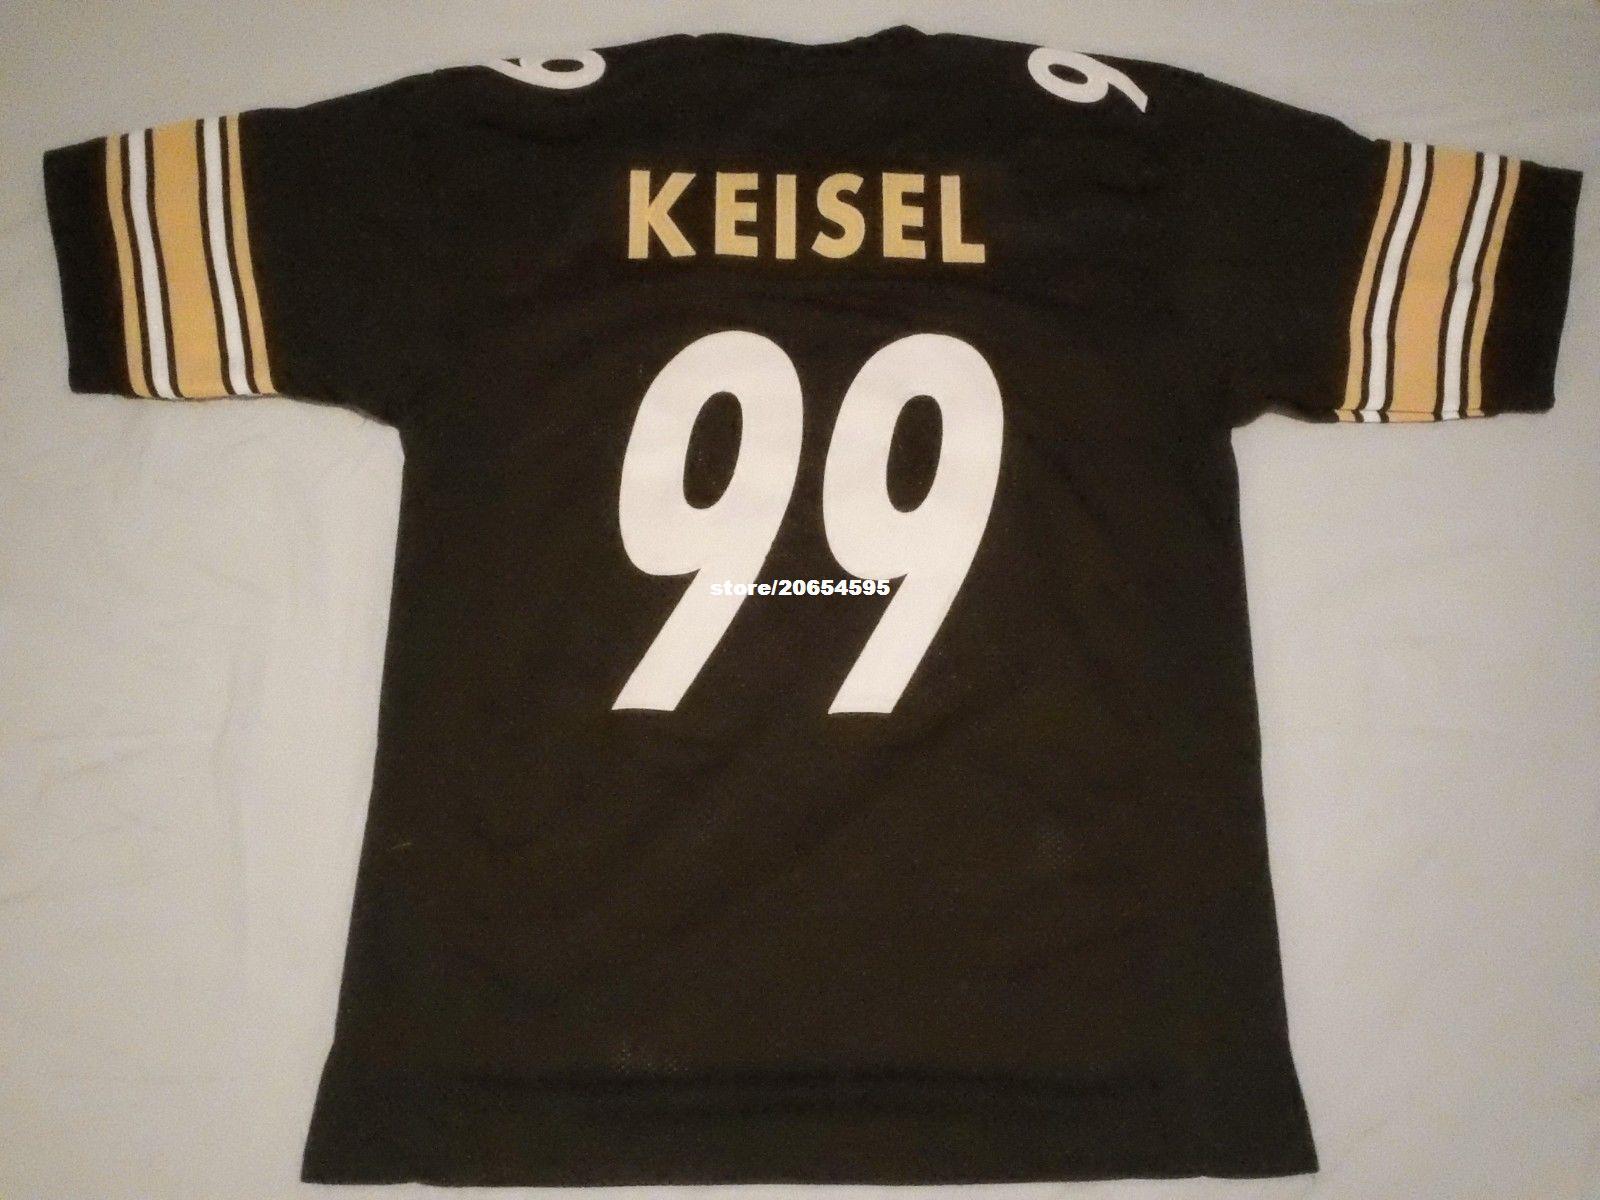 94ed679e9 ... 2017 Cheap Retro Custom Sewn Stitched 99 Brett Keisel Black Jersey  Throwback MenS Football Jerseys From ...